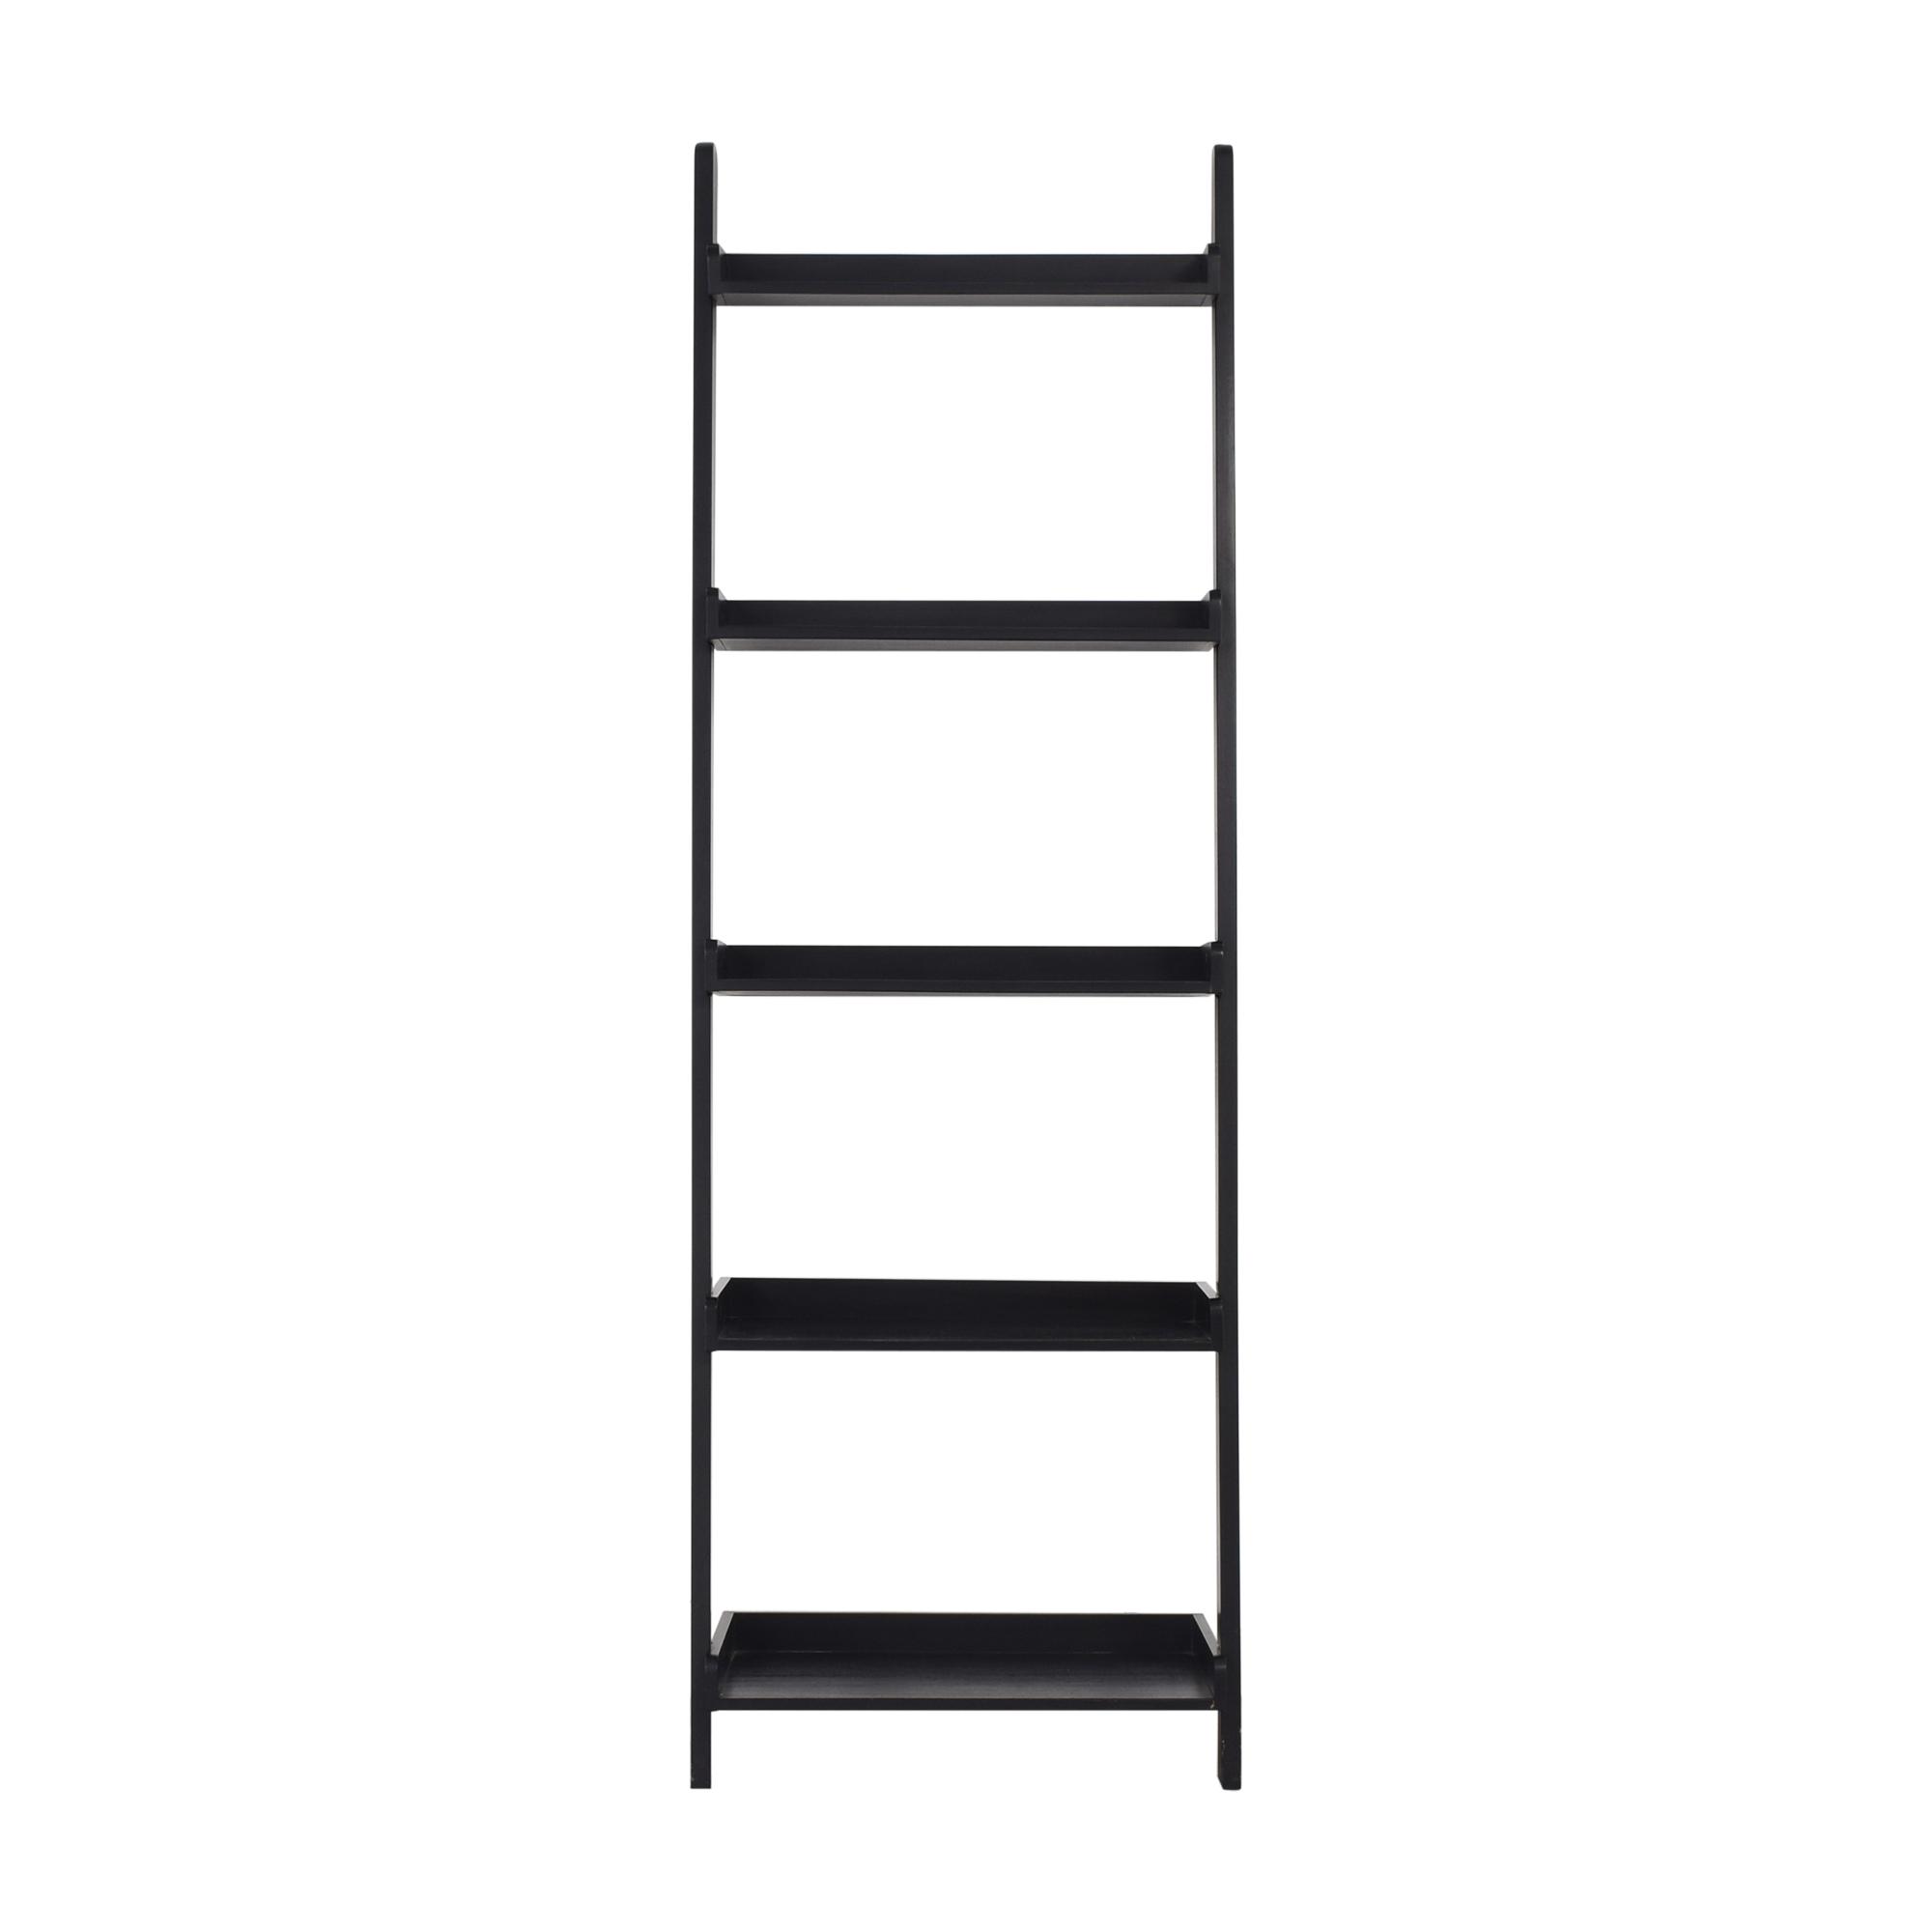 shop Crate & Barrel Crate & Barrel Ladder Bookcase online